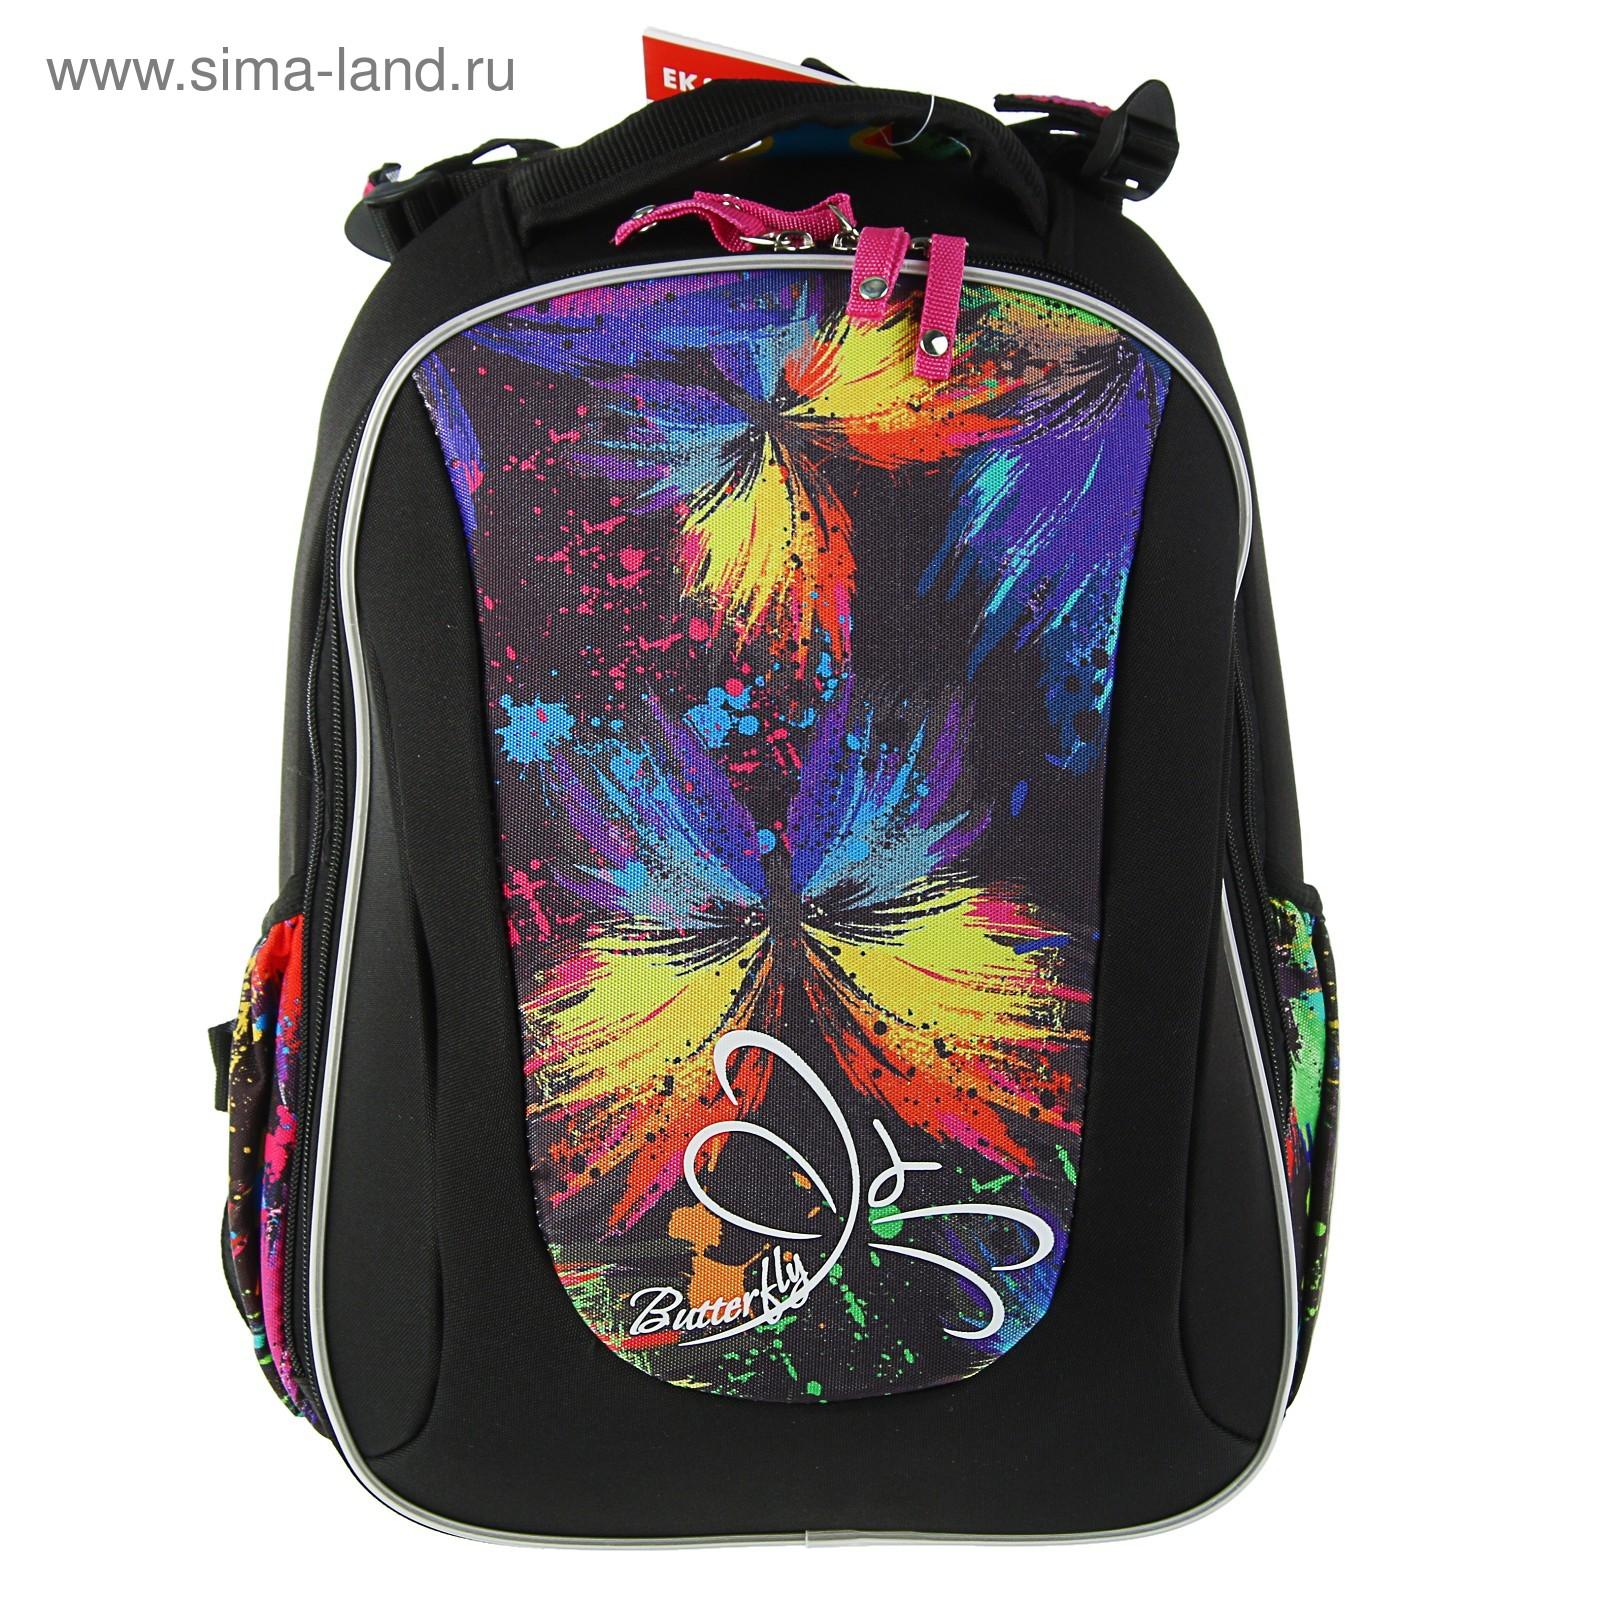 f885d2ac898d Рюкзак каркасный школьный эргономичная спинка Erich Krause Multi Pack  40*32*18, Neon